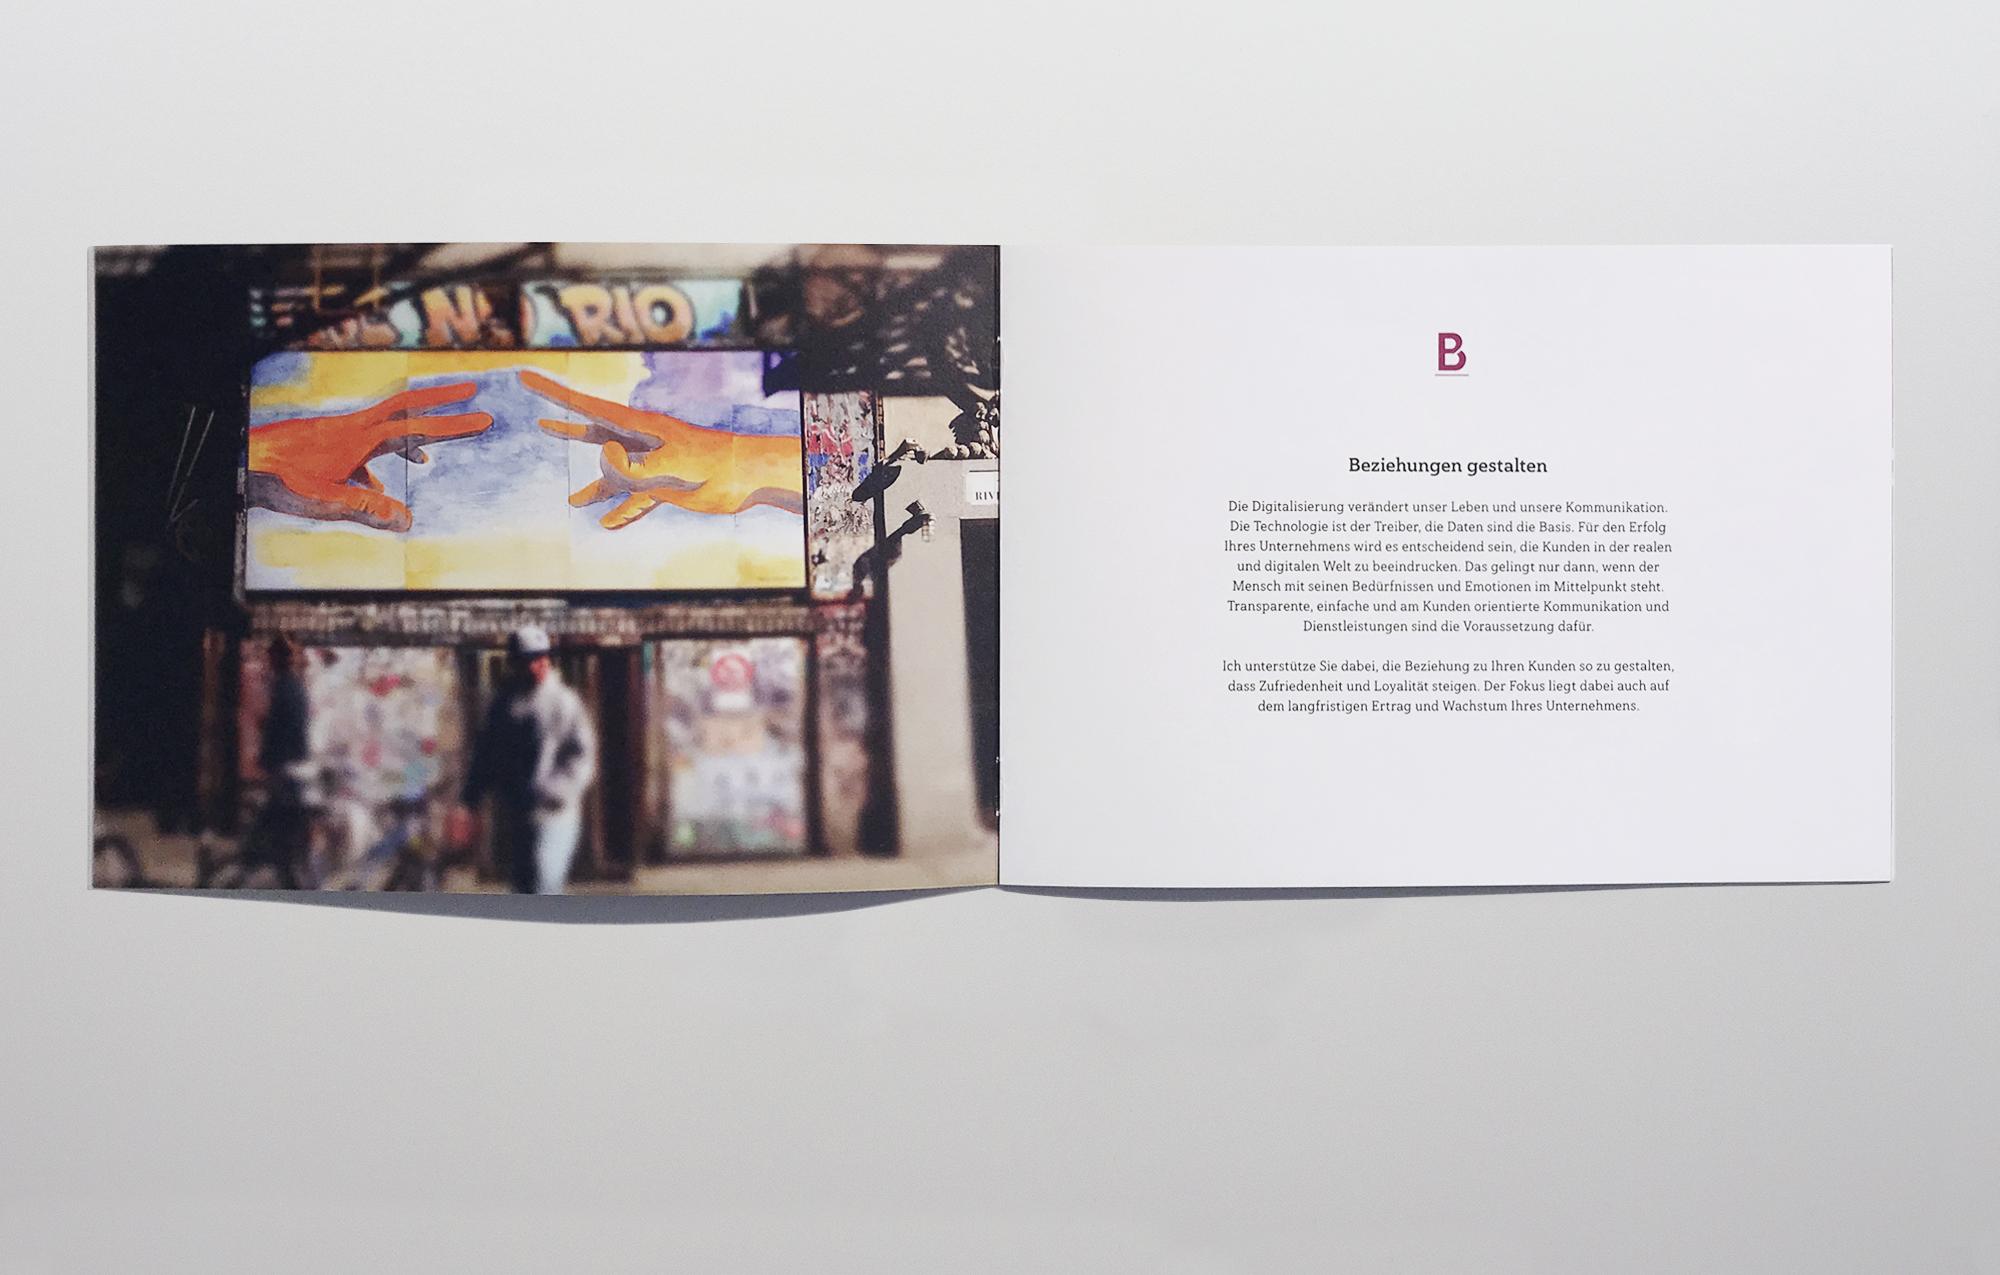 Büro an der Wien, badw, Bornemann, Corporate Design, Brand Identity, Folder